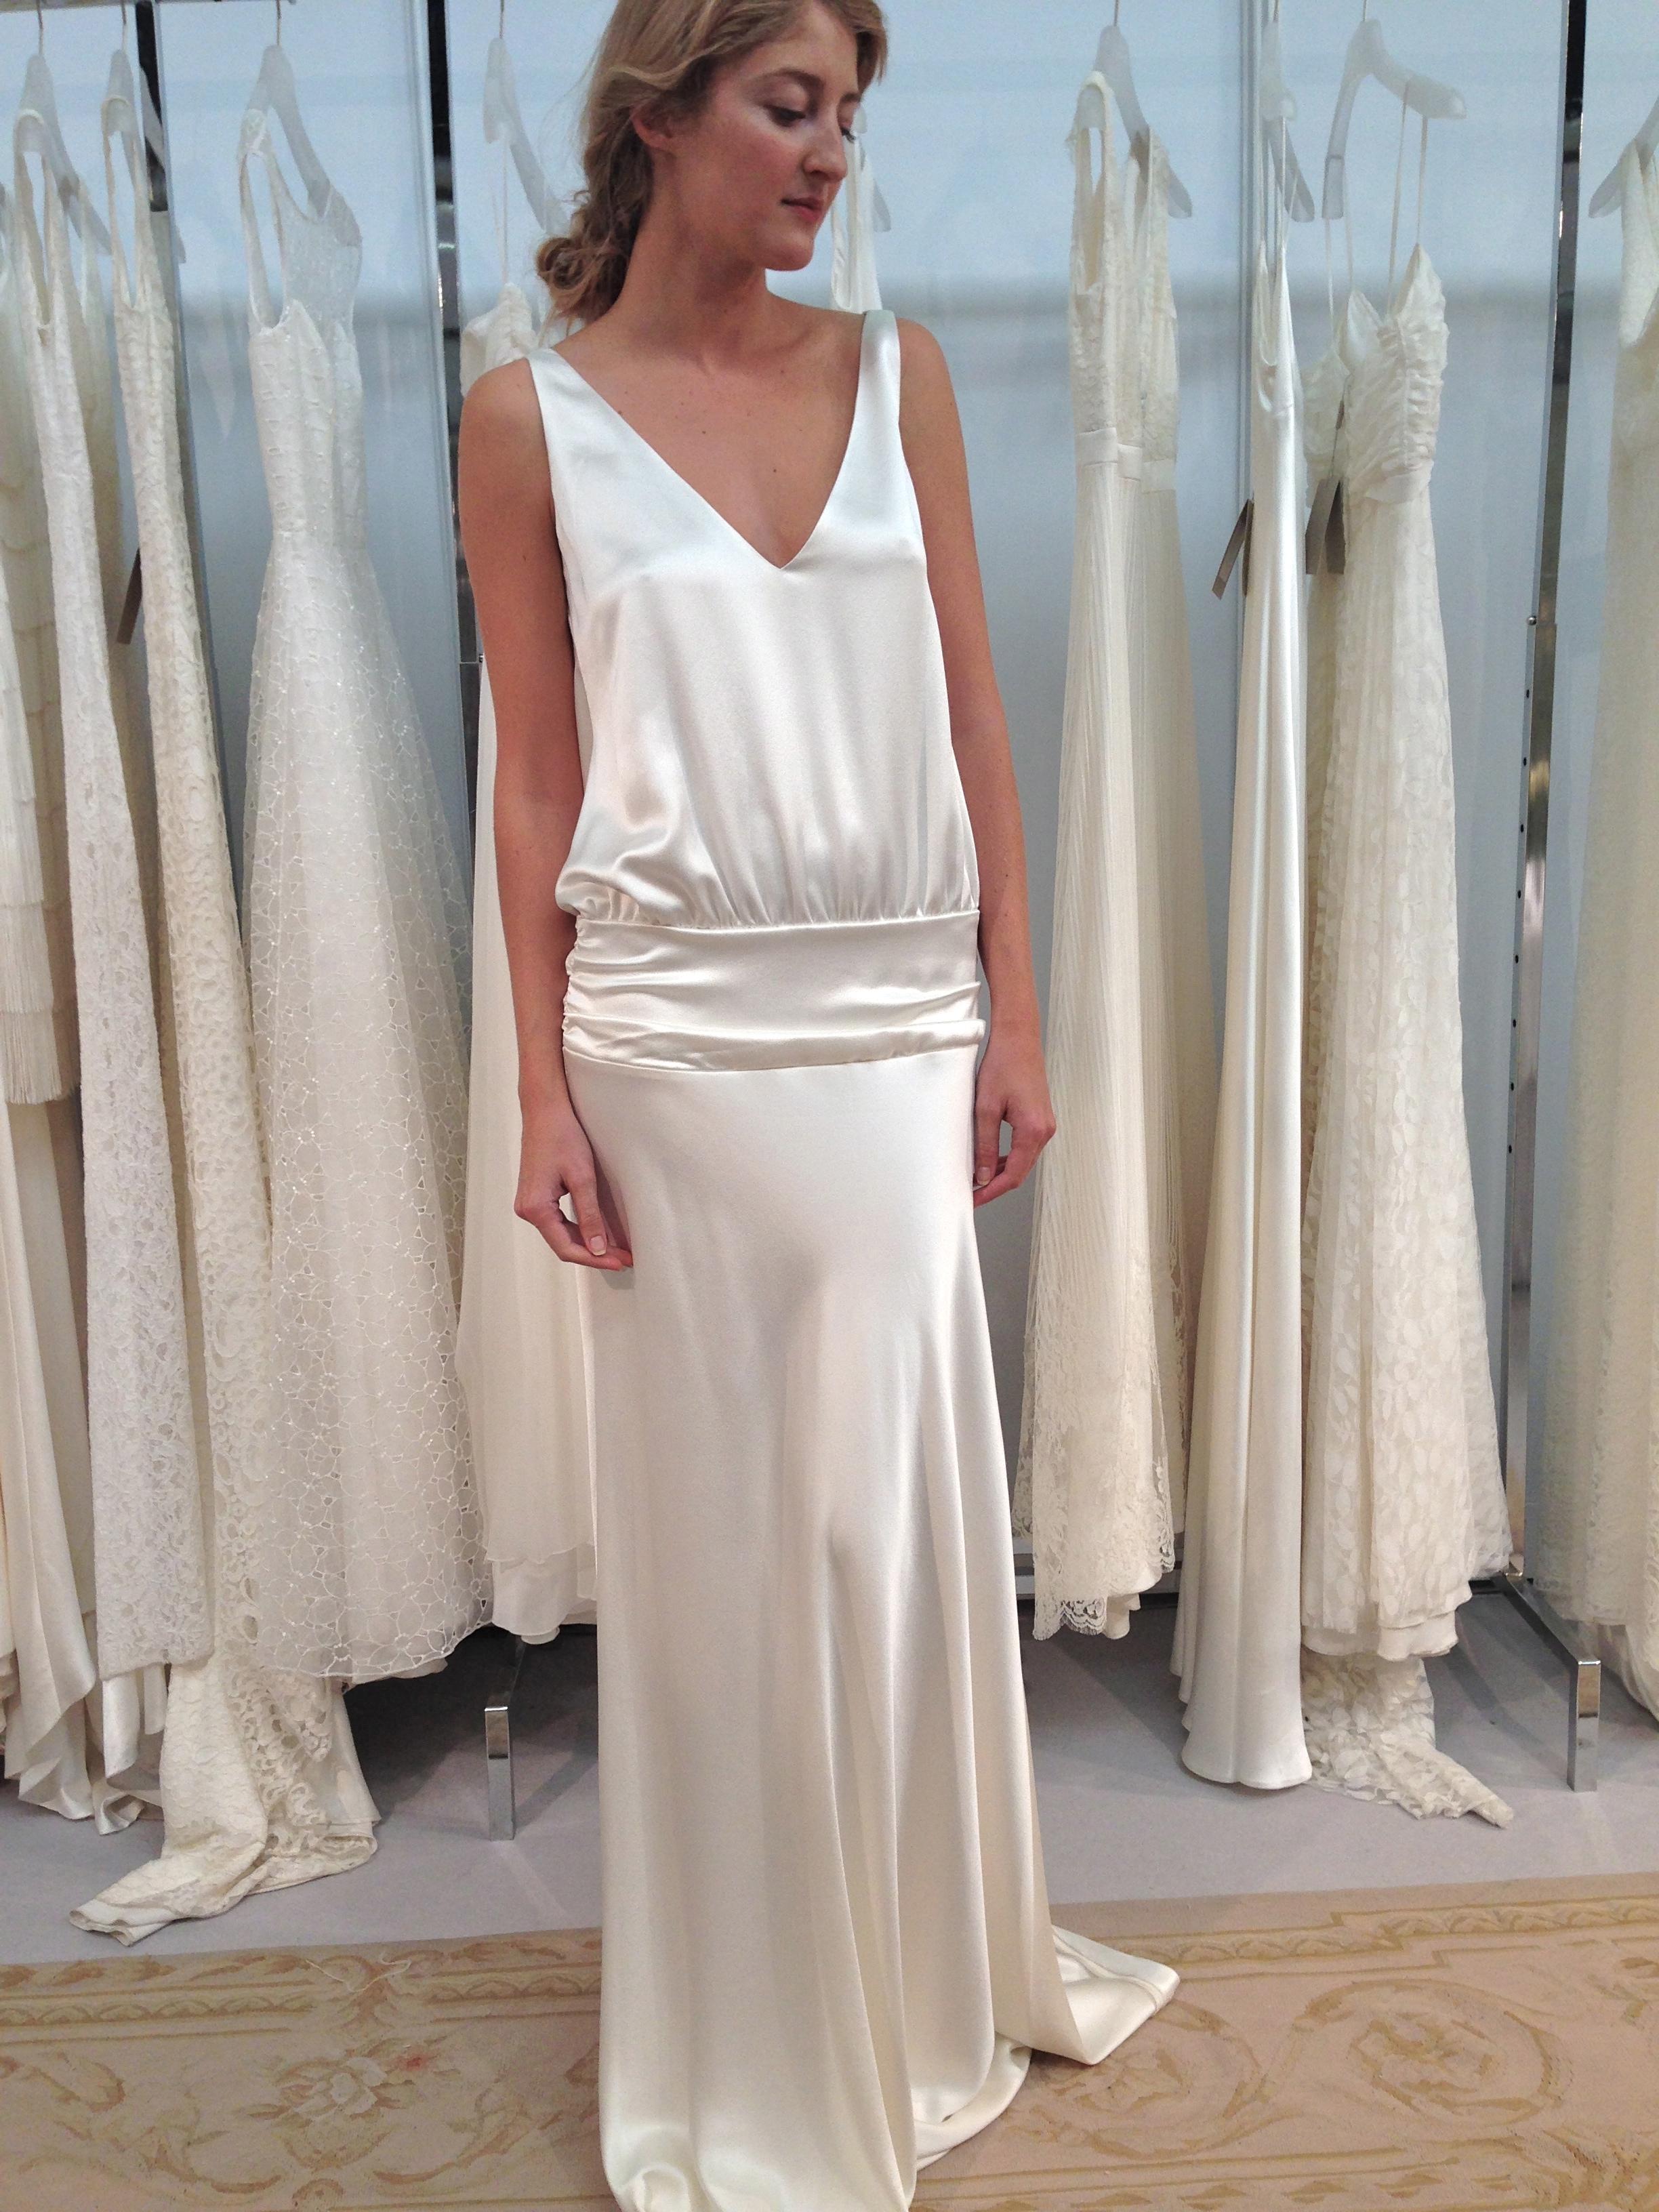 Blog little white dress bridal shop denver colorados best all junglespirit Image collections